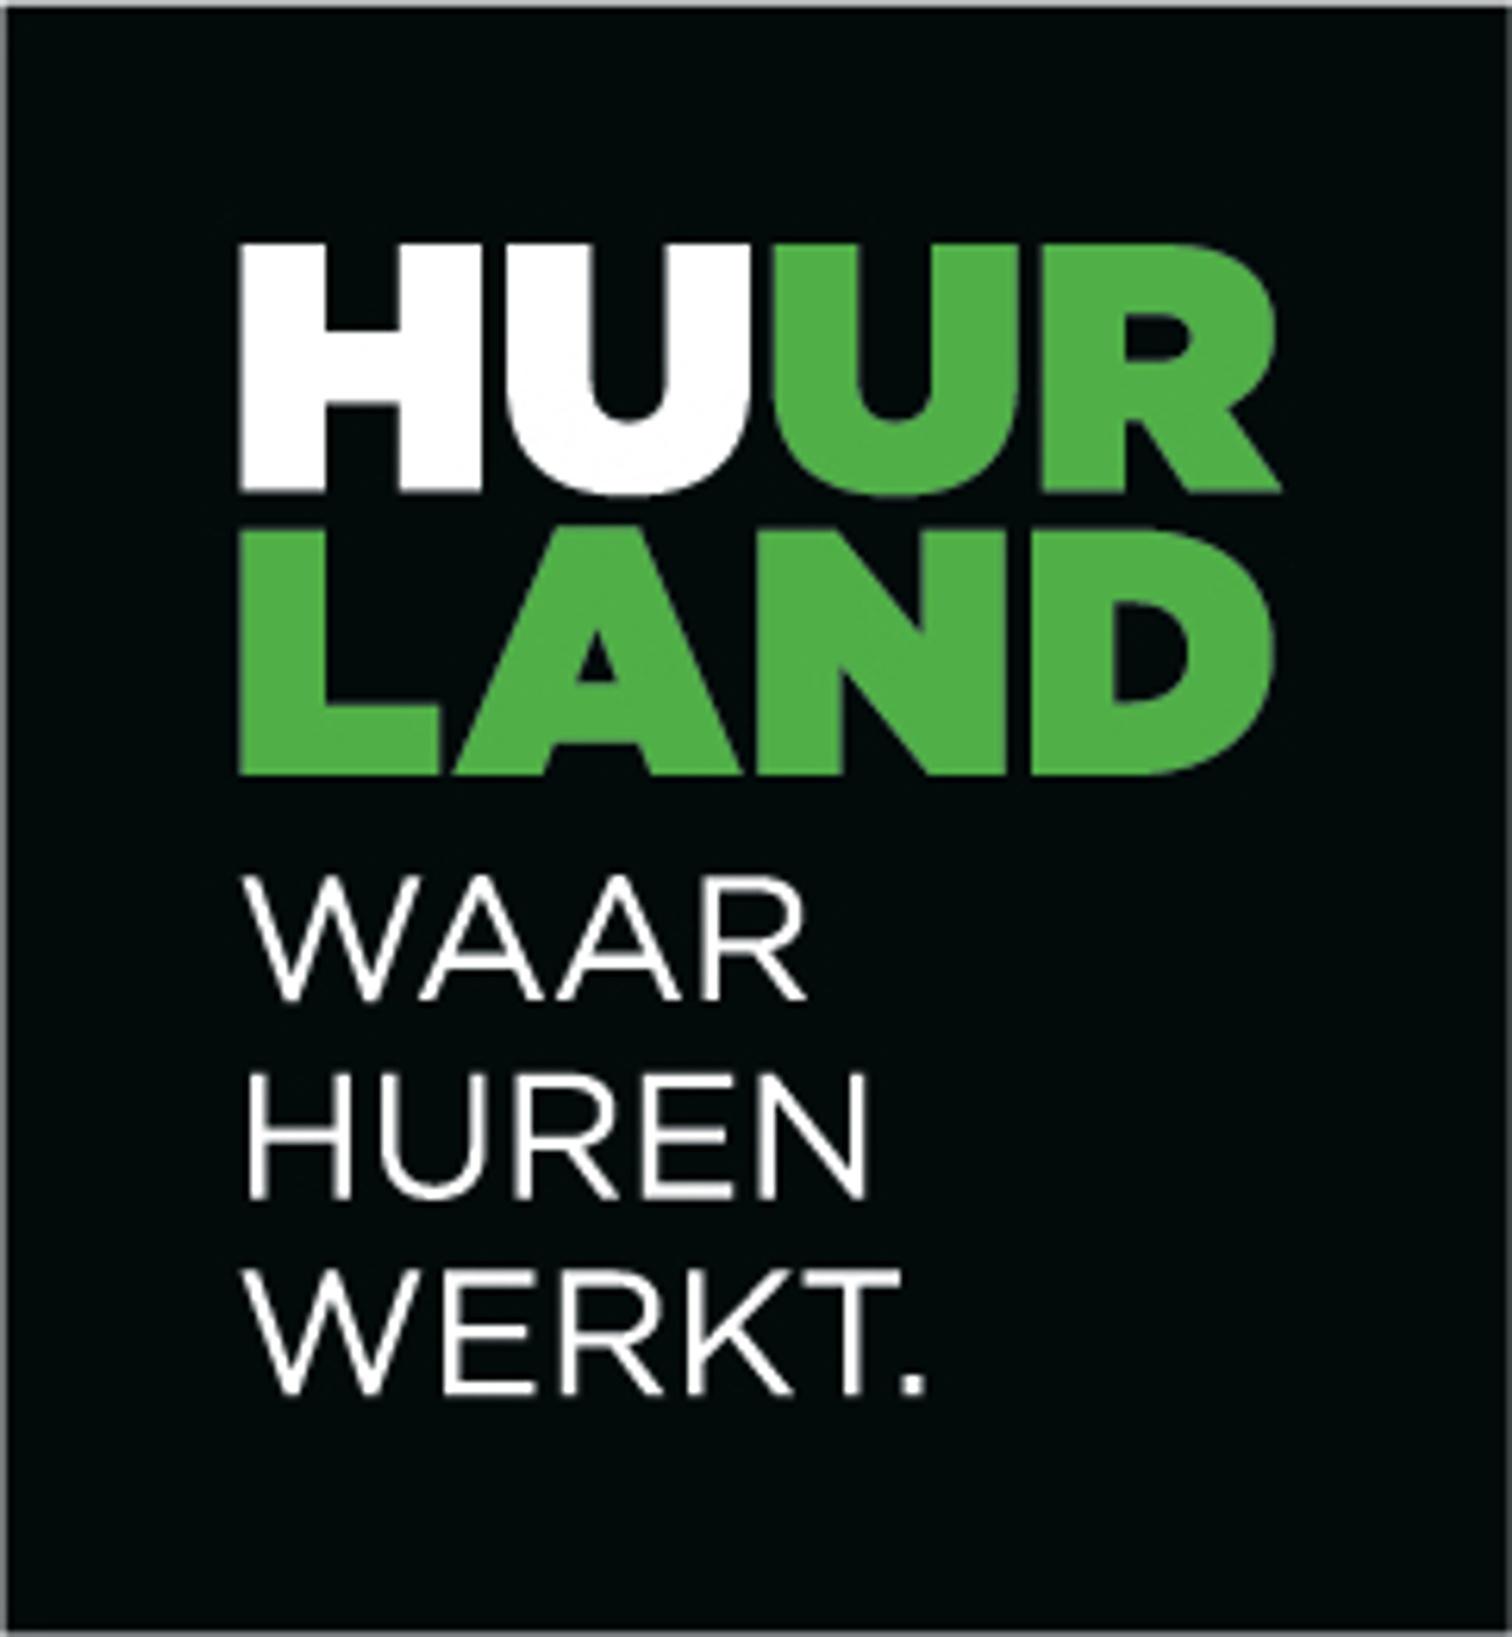 logo Huurland Aalst